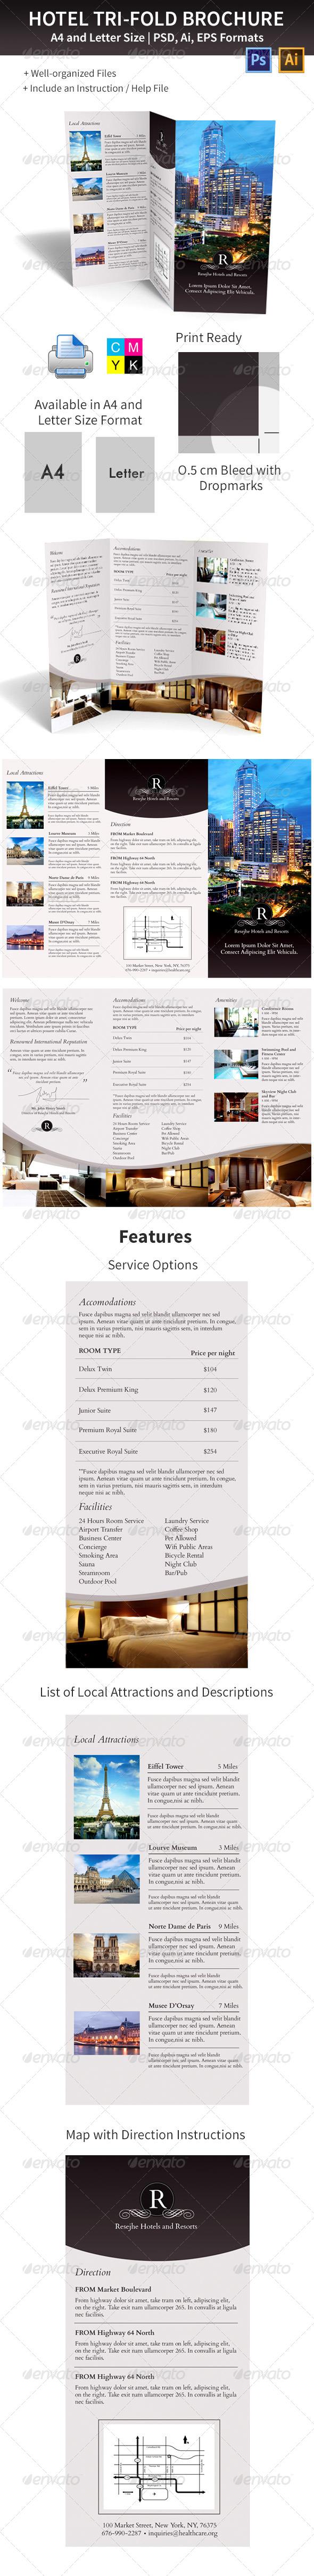 GraphicRiver Hotel Trifold Brochure 5927700